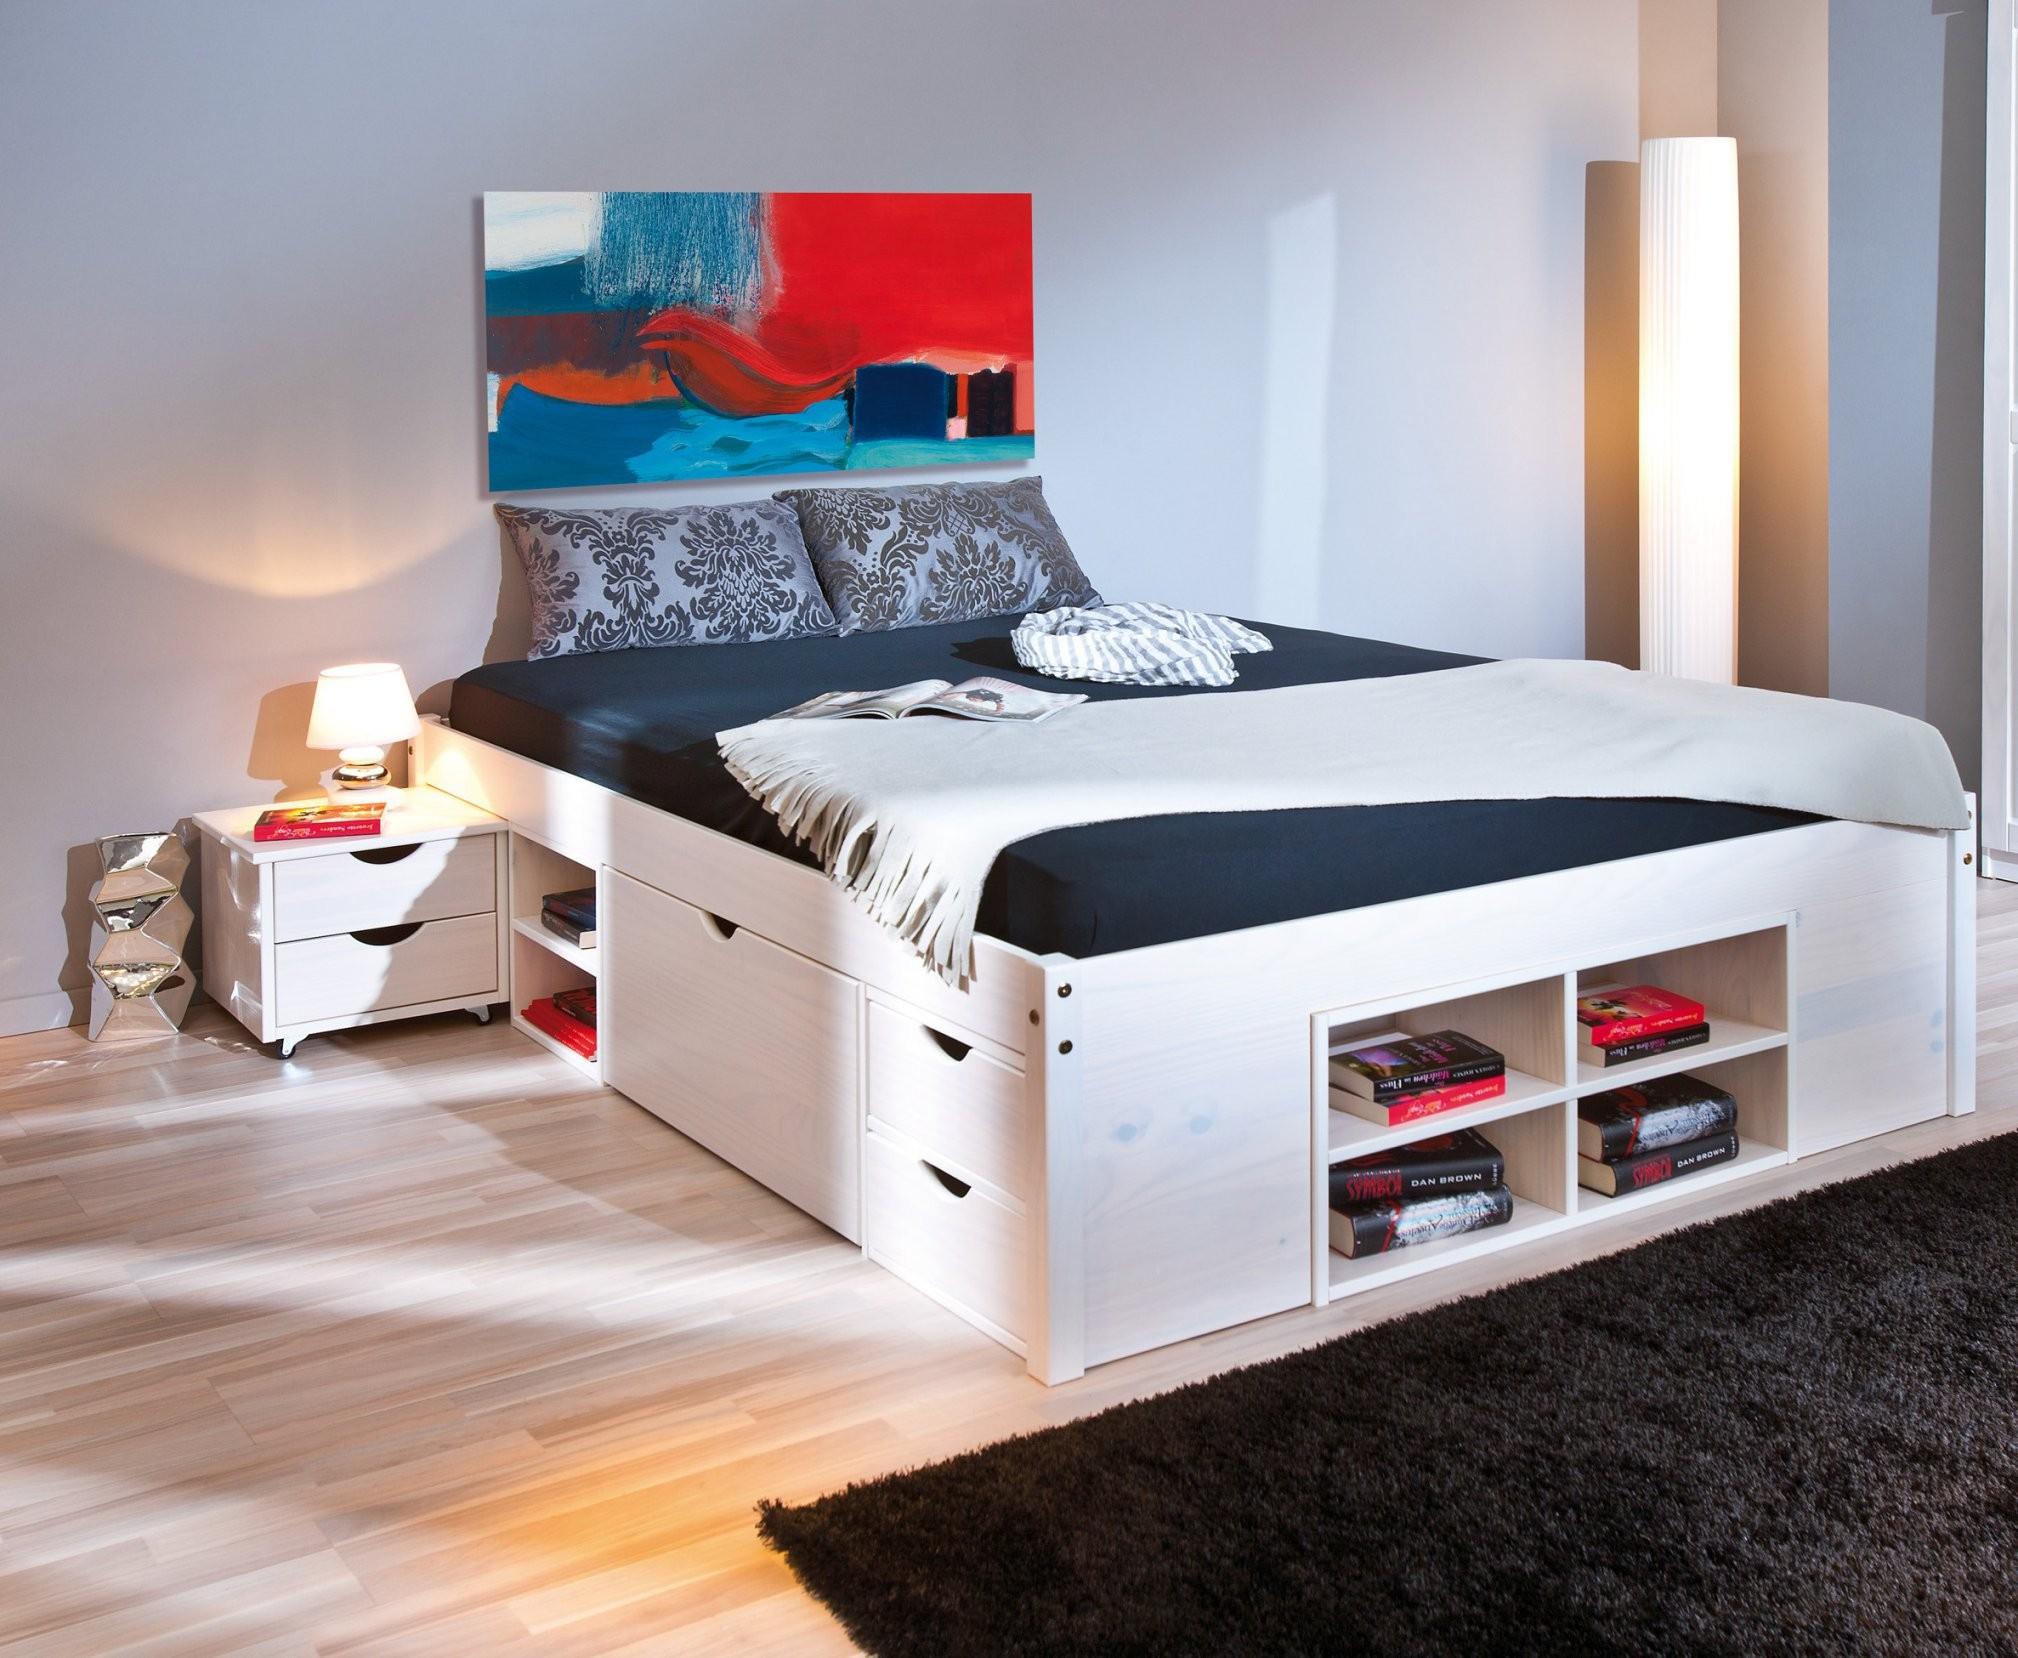 Bett Funktionsbett 140 X 200 Cm Massiv Kiefer Weiss Woody 14800011 von Bett 140X200 Weiß Holz Photo